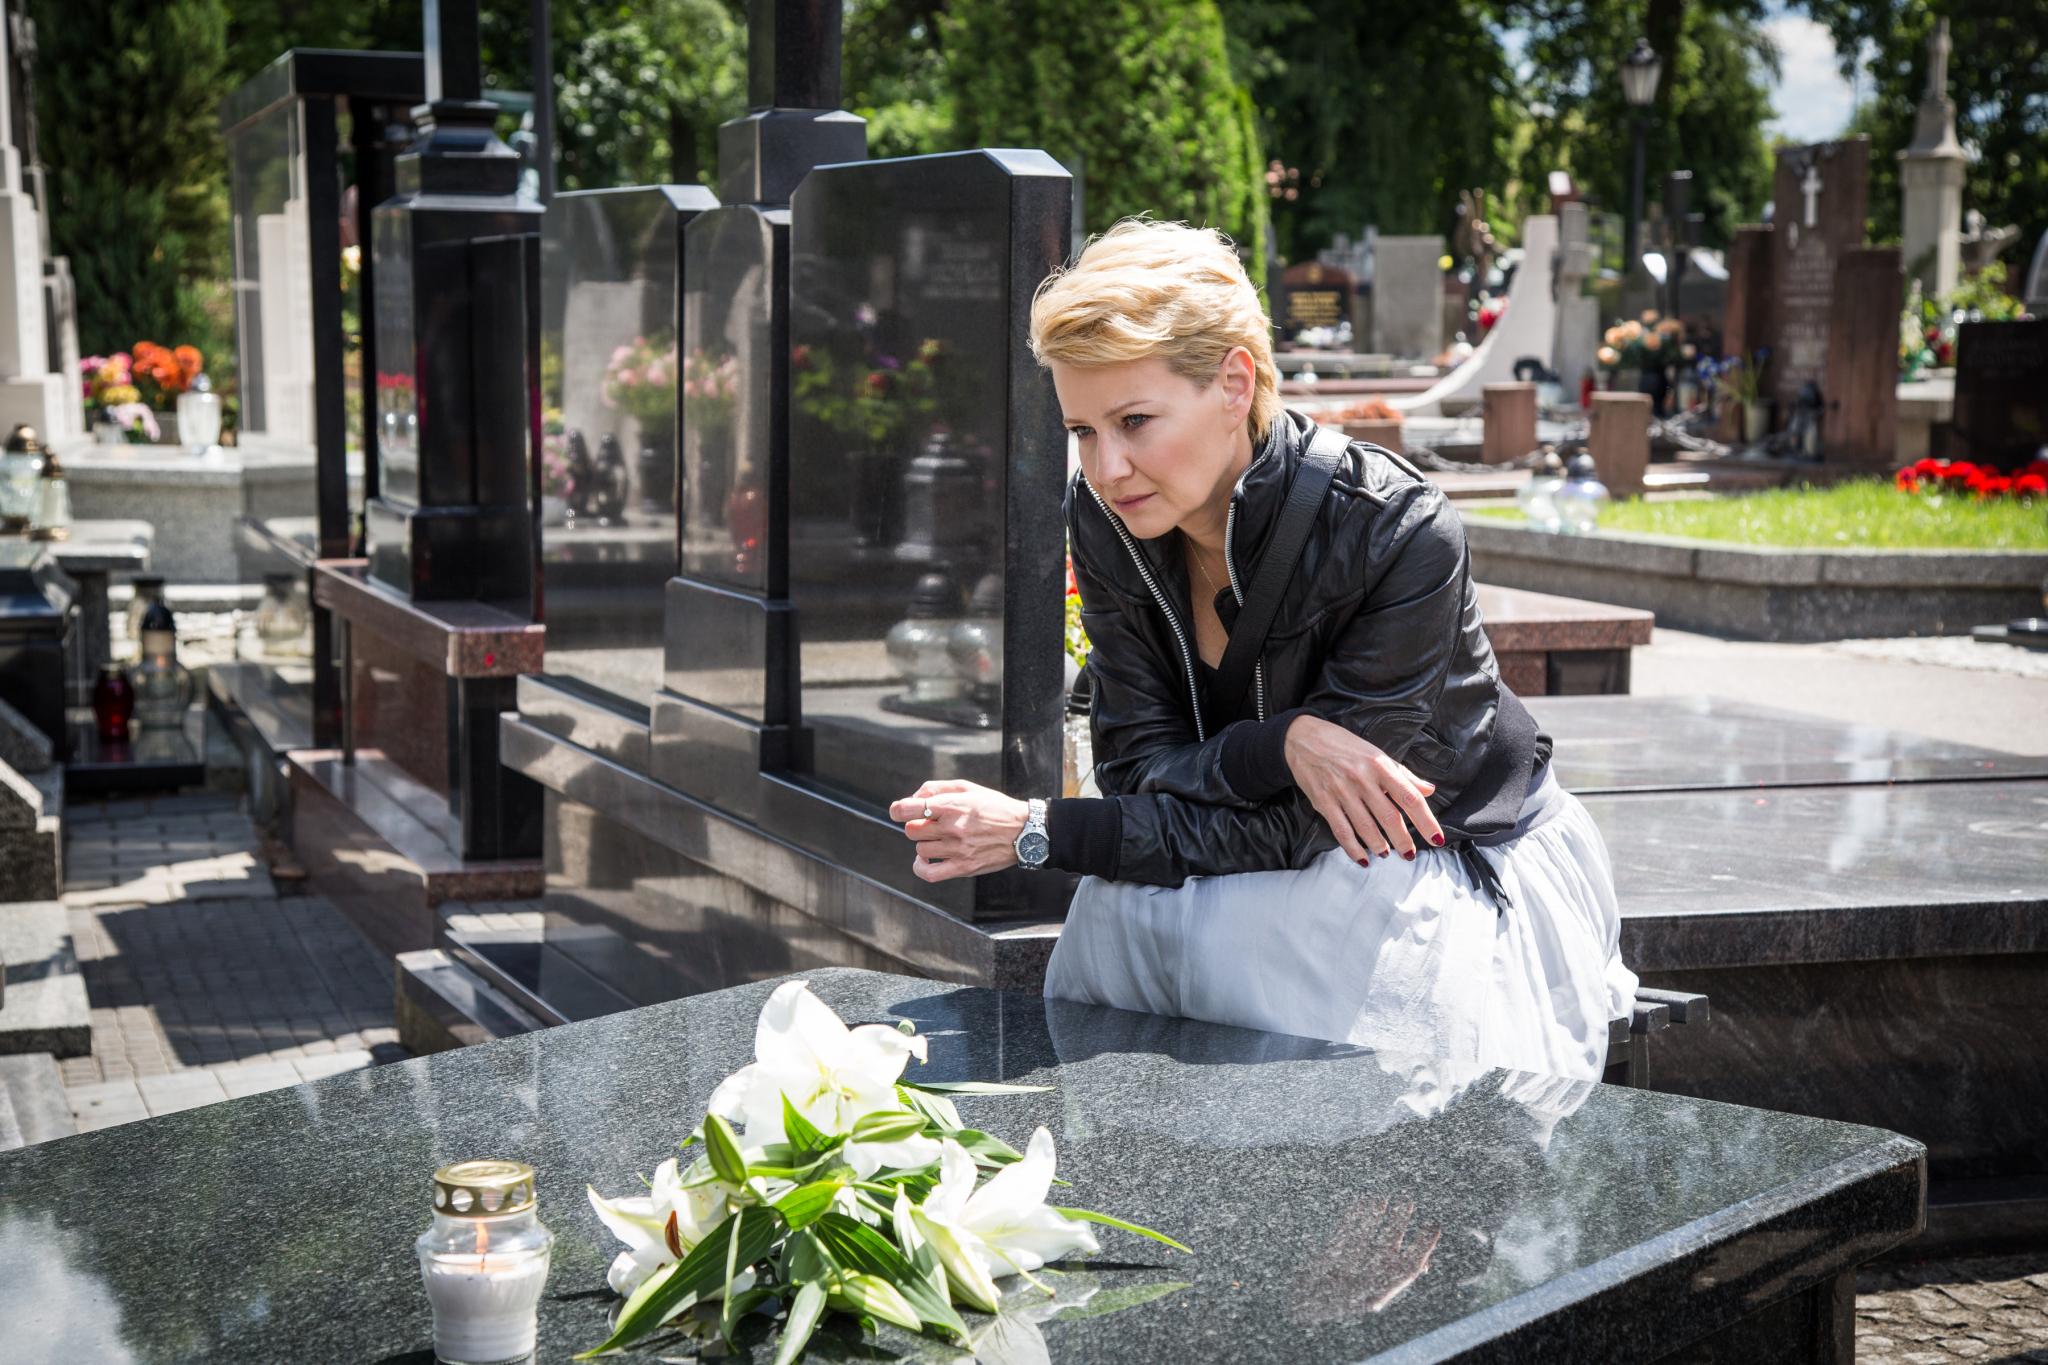 Monika Borecka (Małgorzata Kożuchowska)